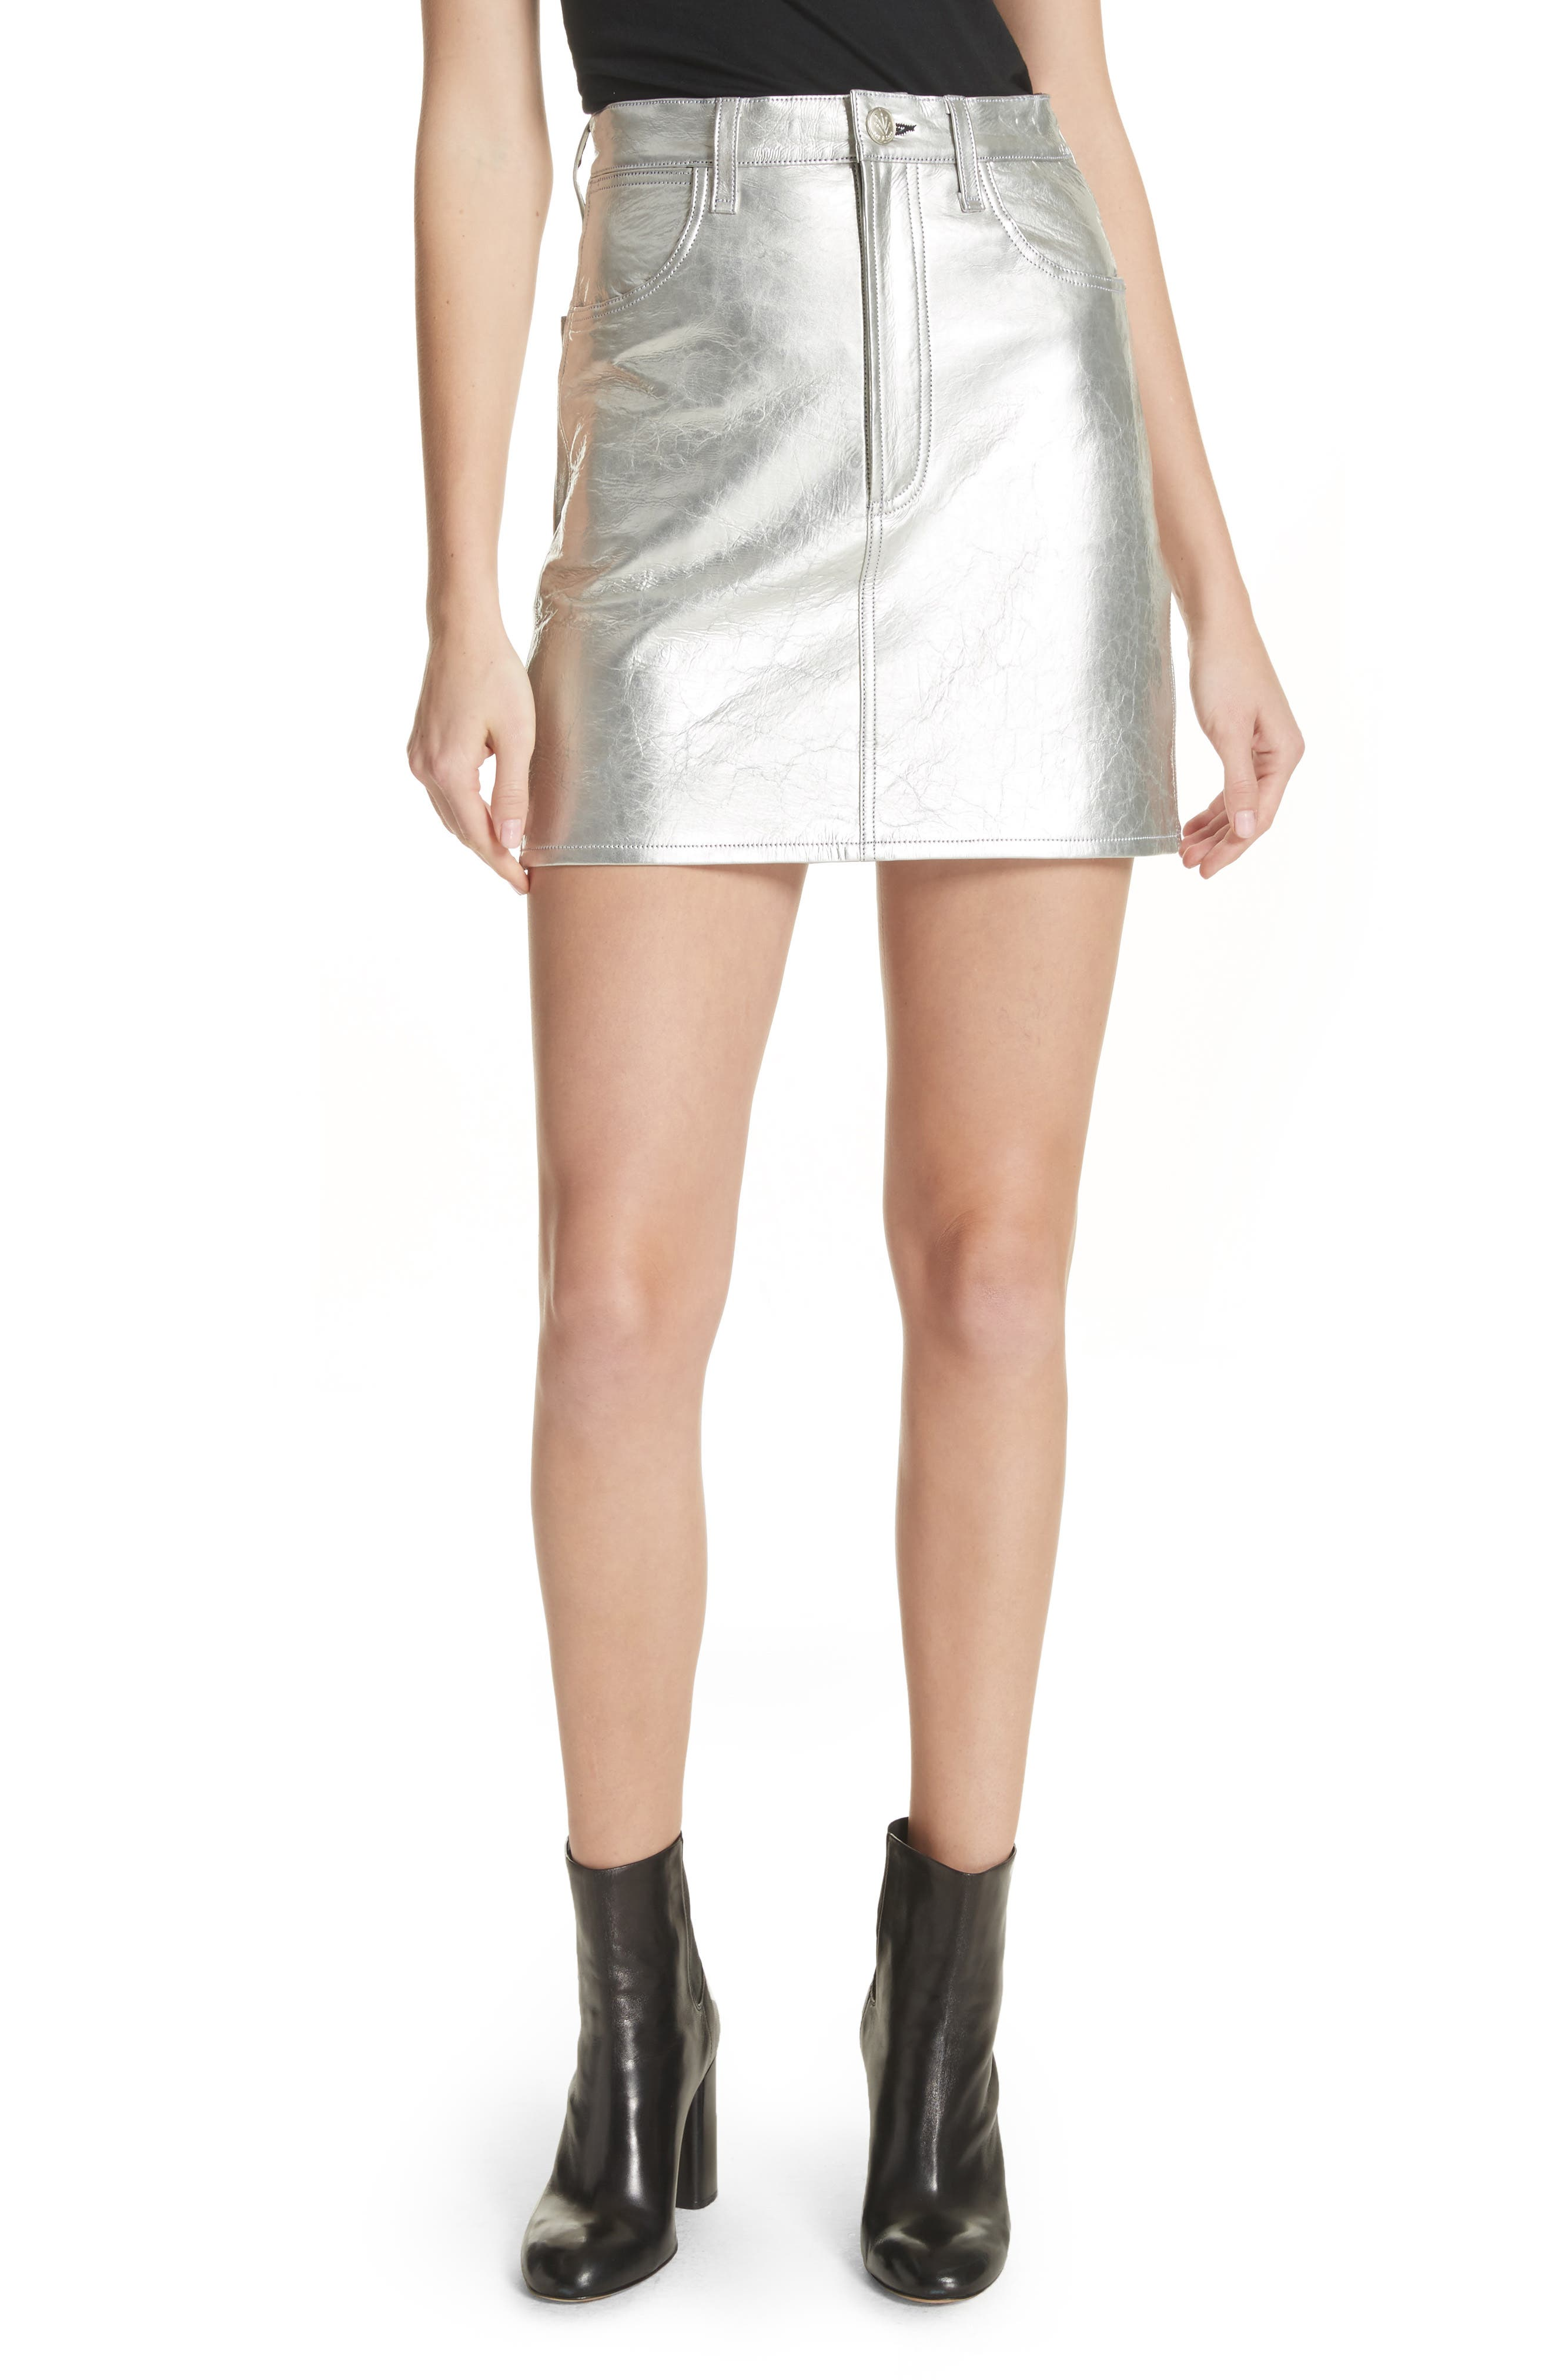 Moss High Waist Leather Miniskirt,                             Main thumbnail 1, color,                             041